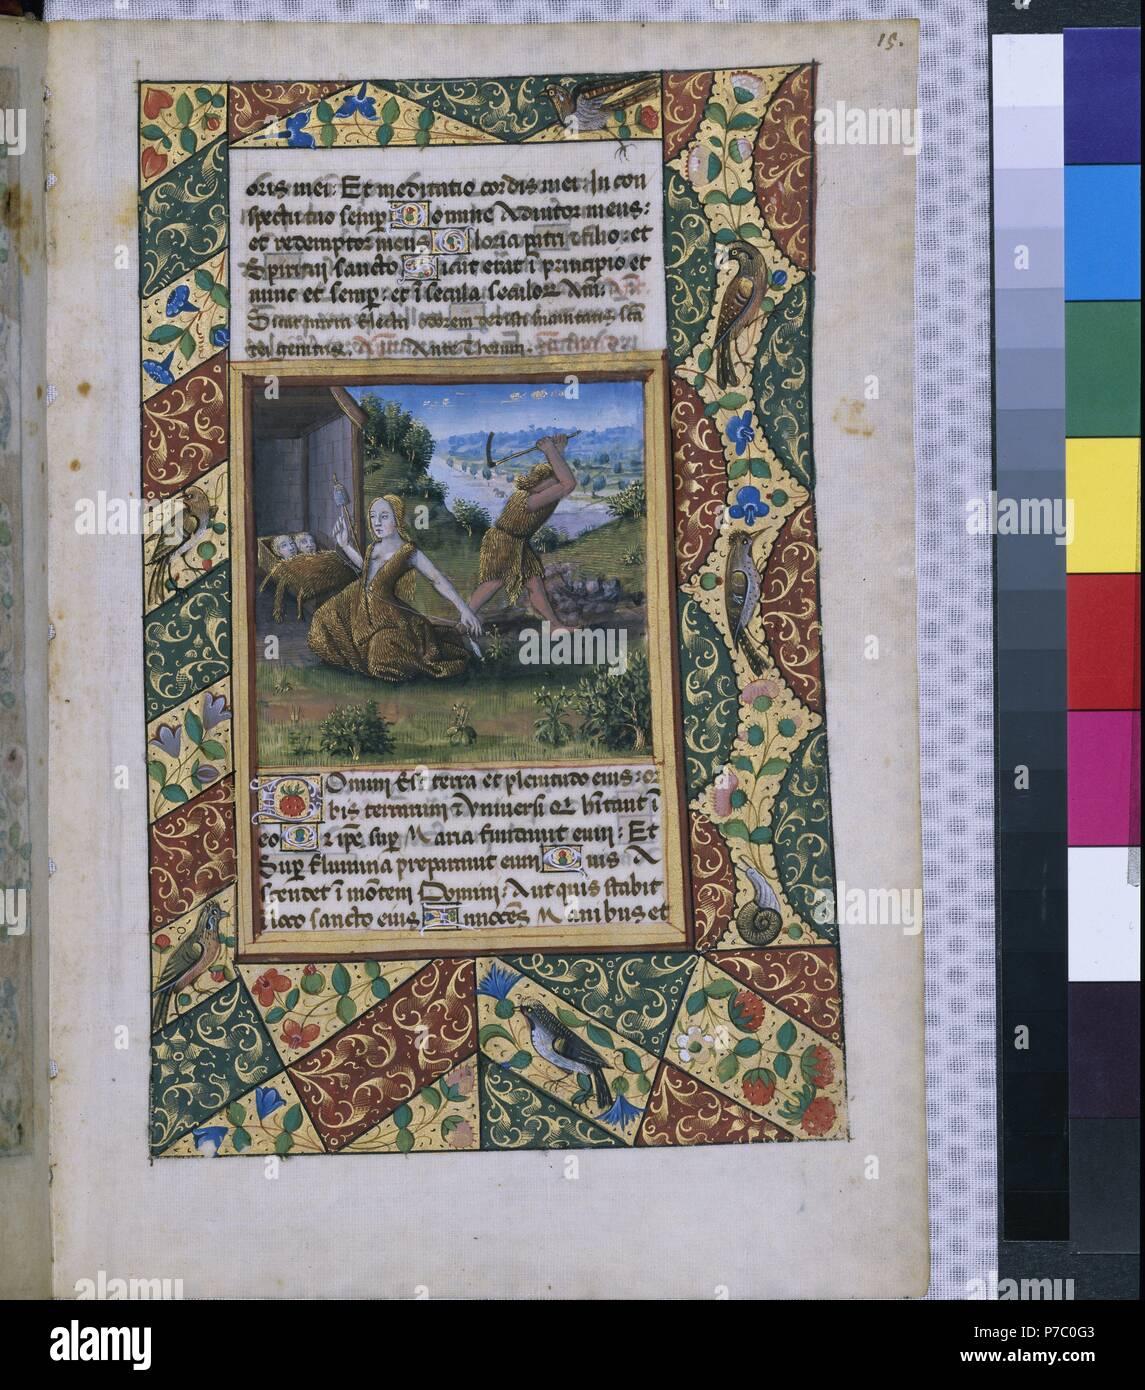 Libro de Horas De Luis de Orleans R15. Museum: BIBLIOTECA NACIONAL DE RUSIA SAN PETERS RUSIA. Stockbild